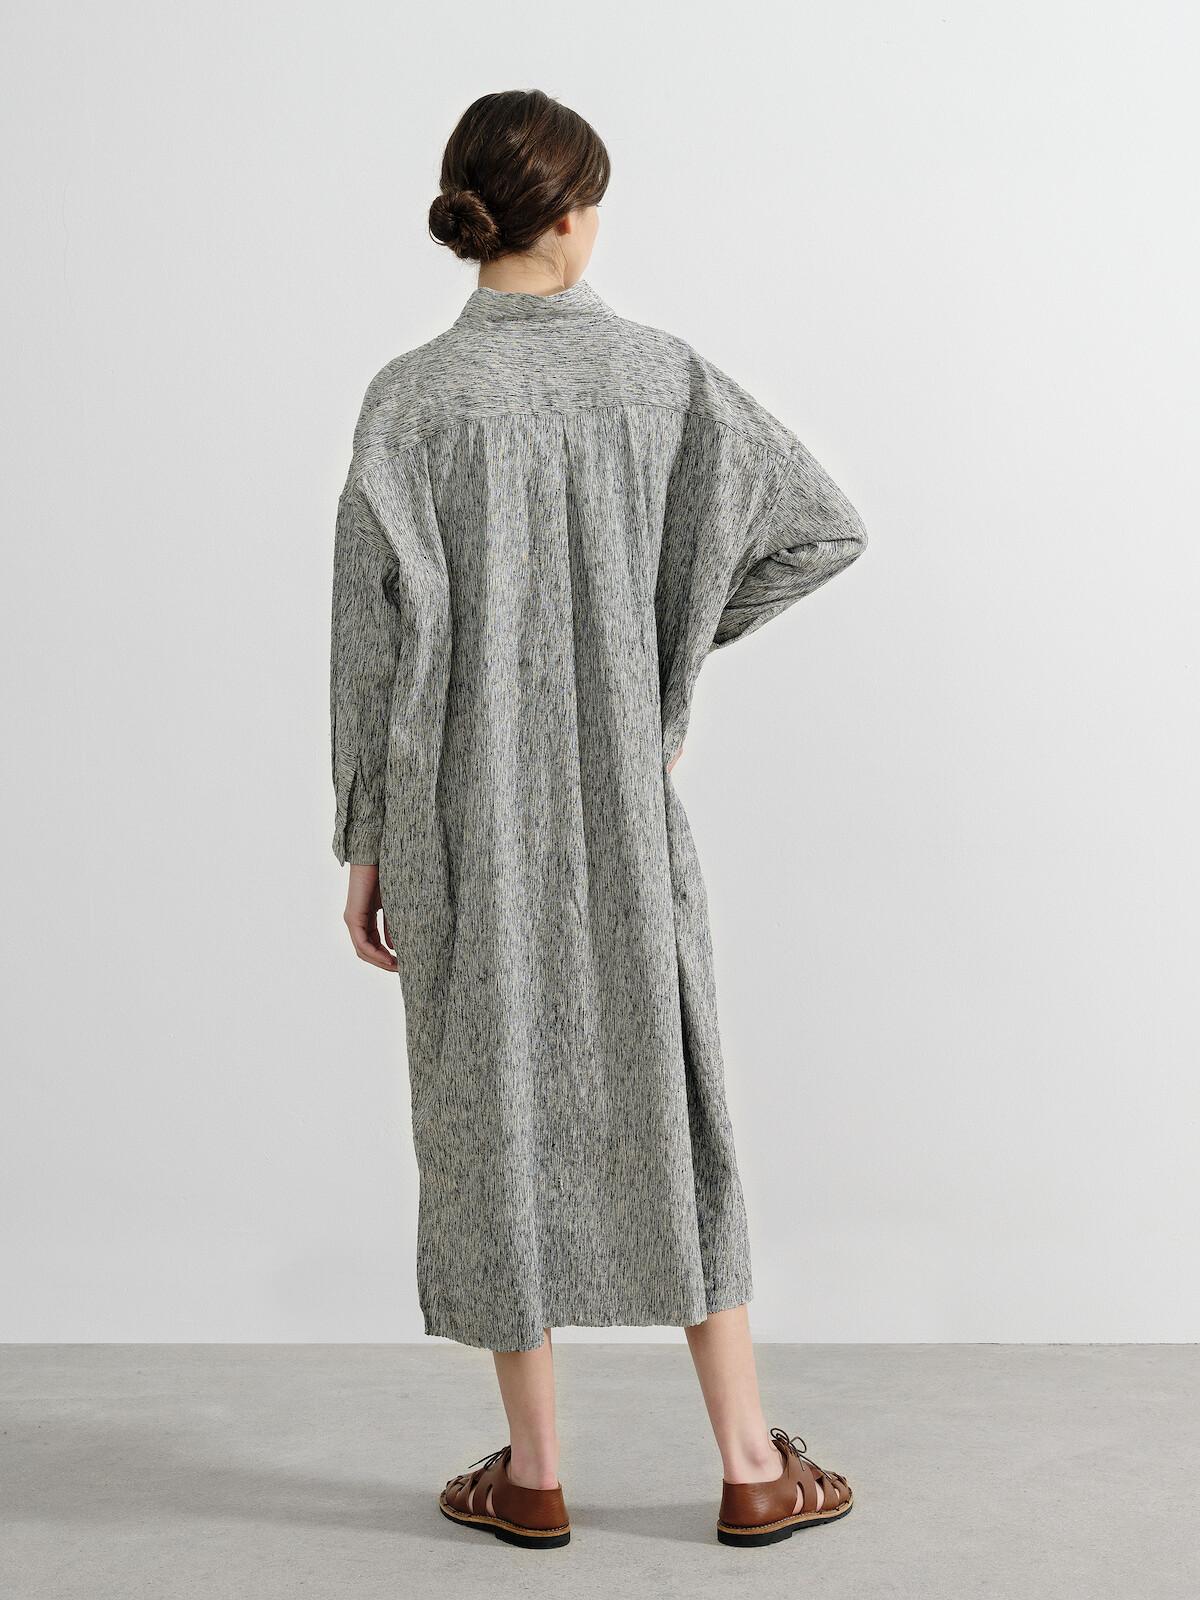 Silk shirt dress Image